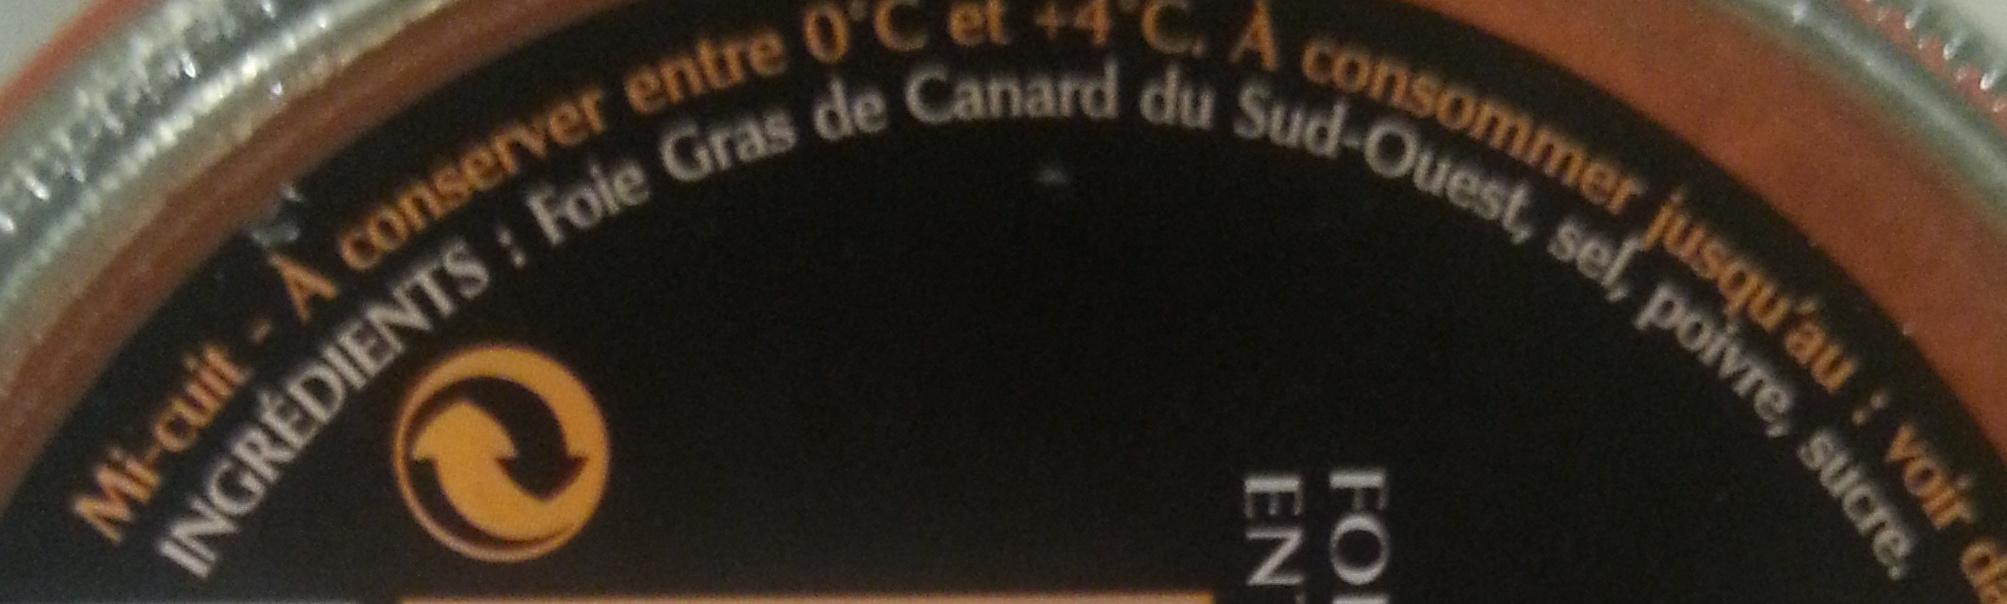 Pure Tradition foie gras de canard entier du sud-ouest - Ingrediënten - fr